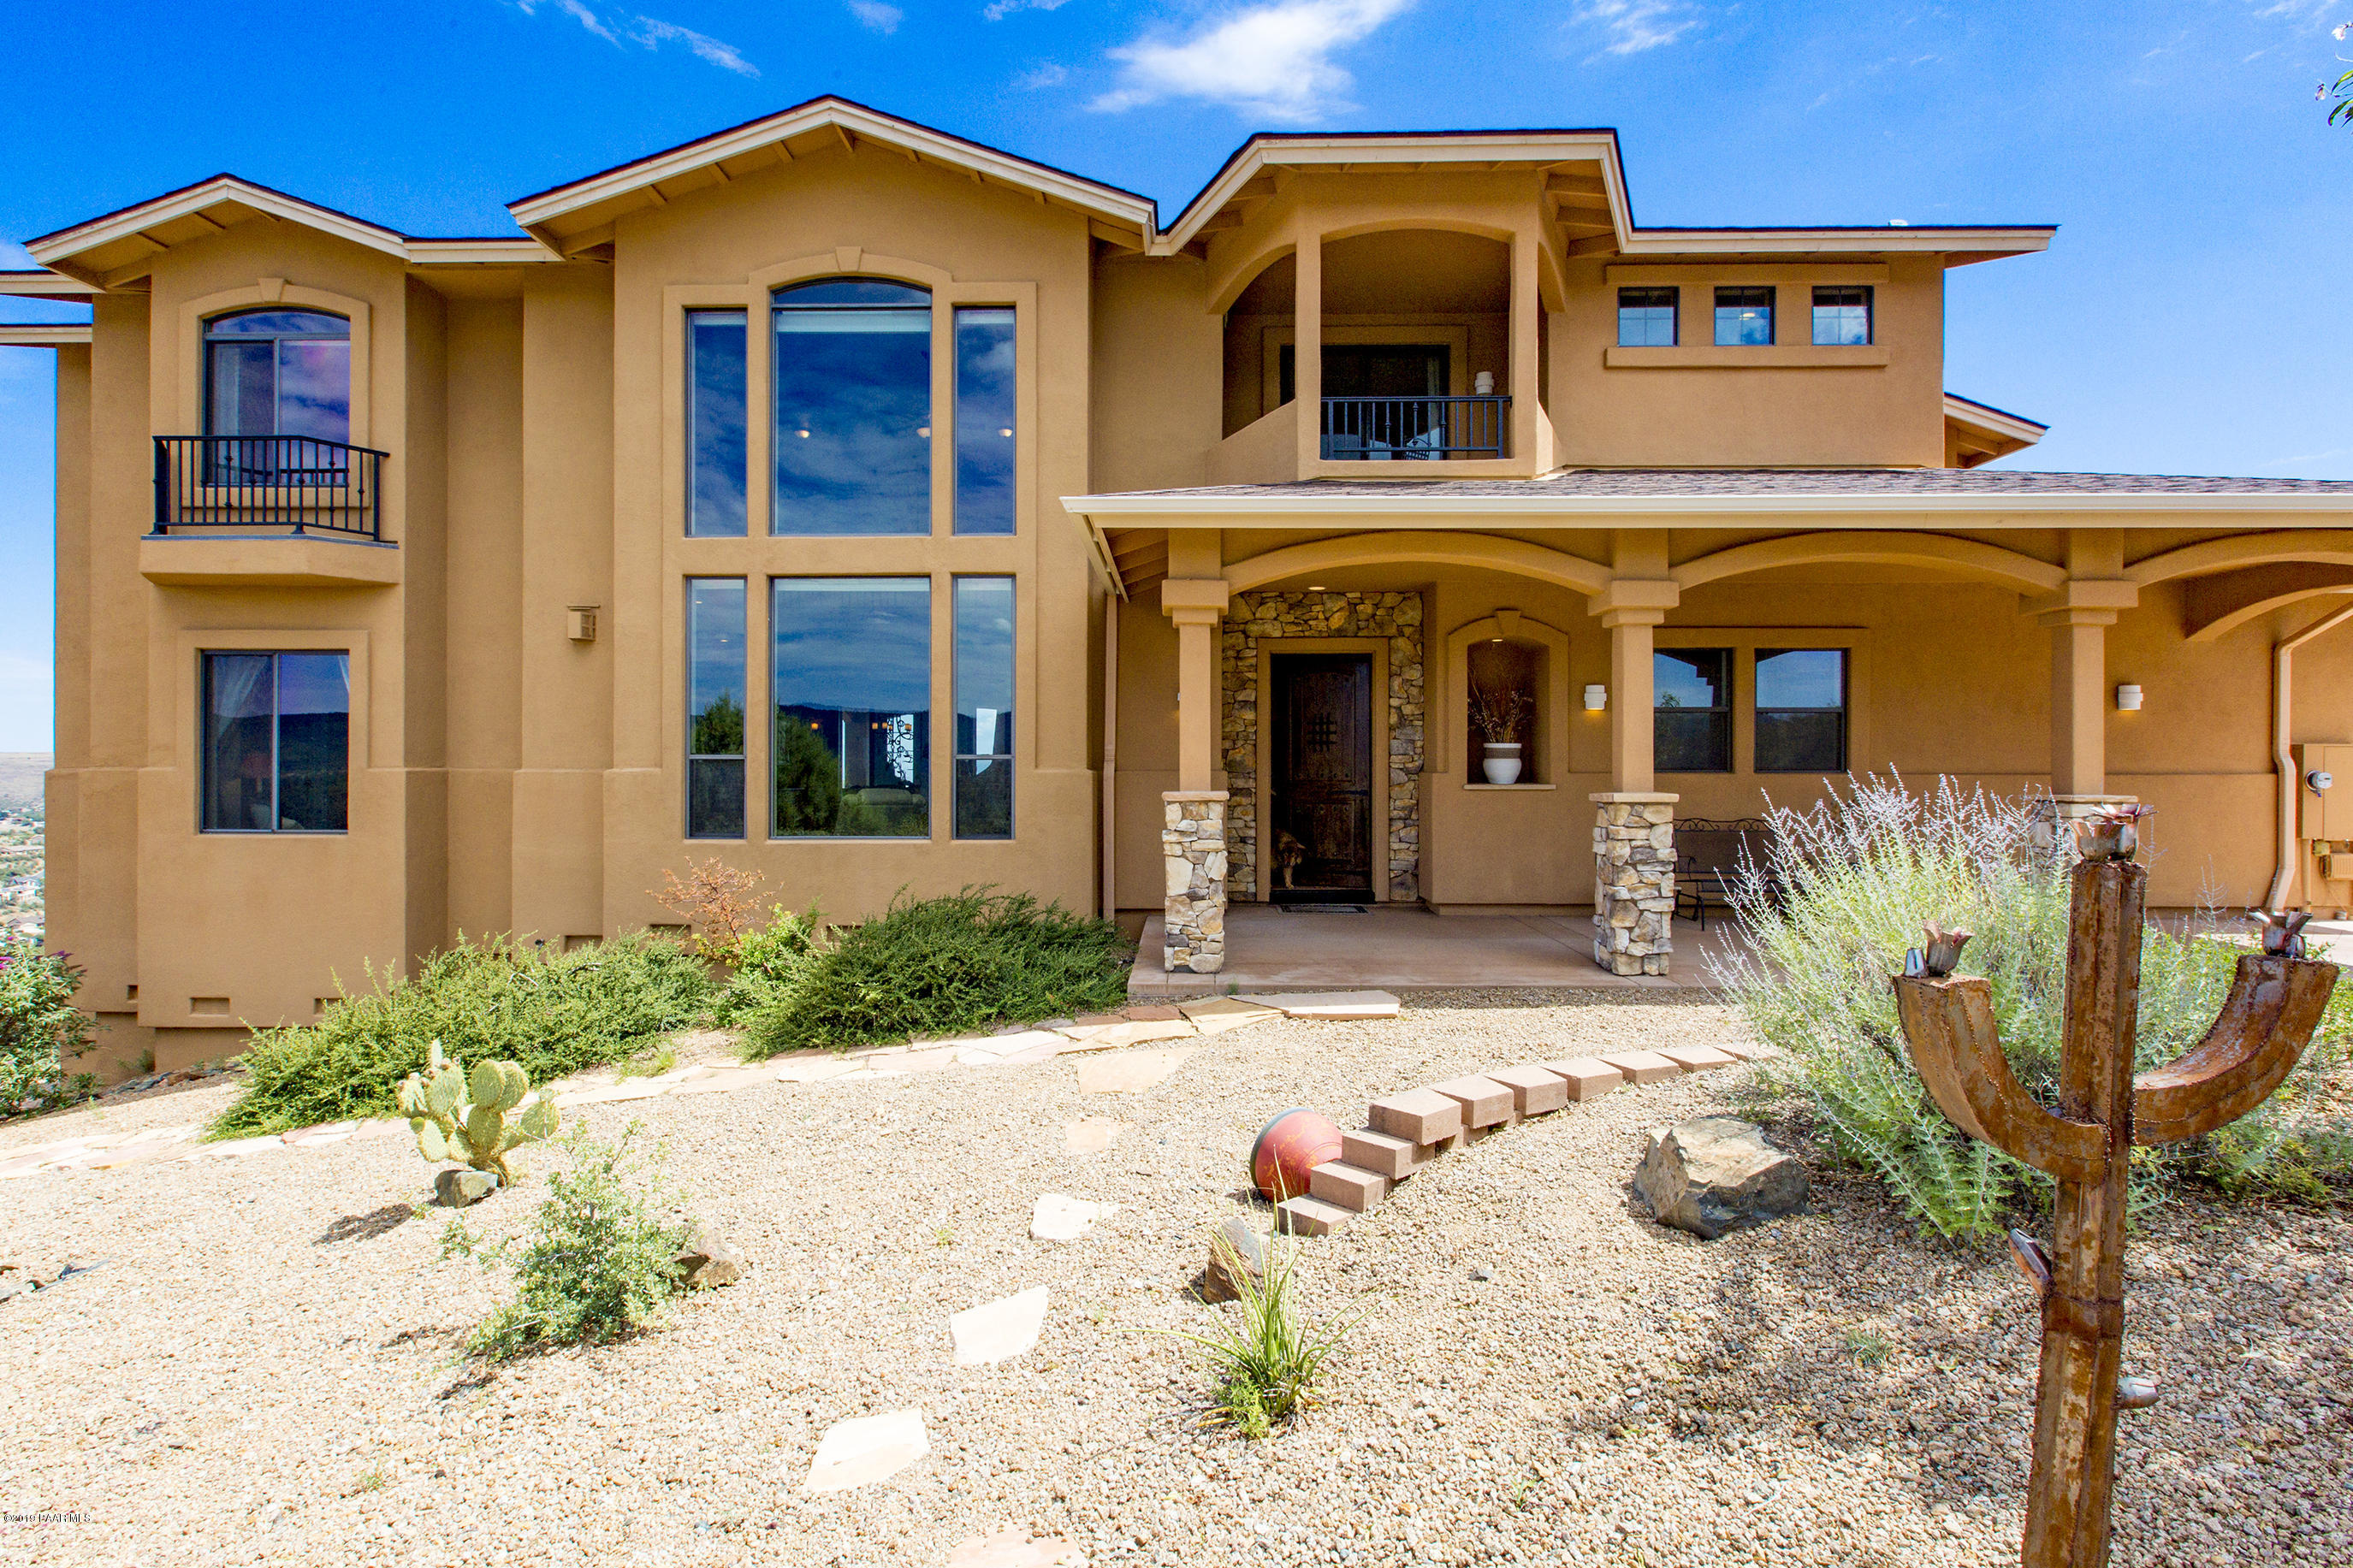 Photo of 235 Angeline, Prescott, AZ 86303